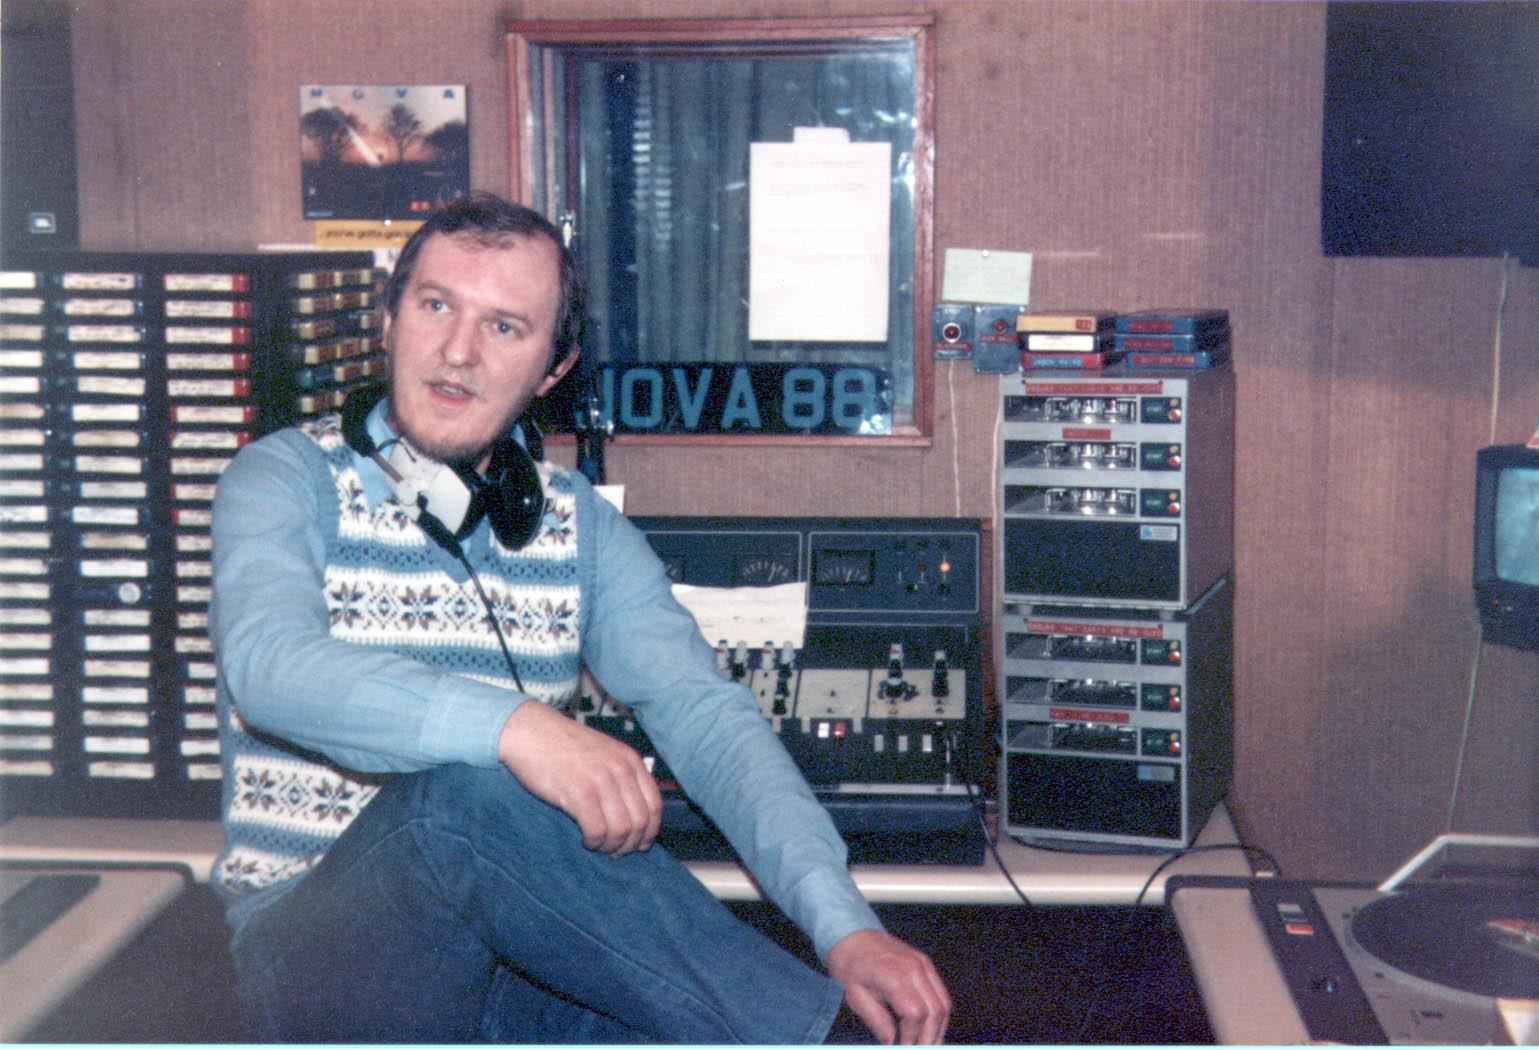 Digital Radio Ireland - Nova audio channels